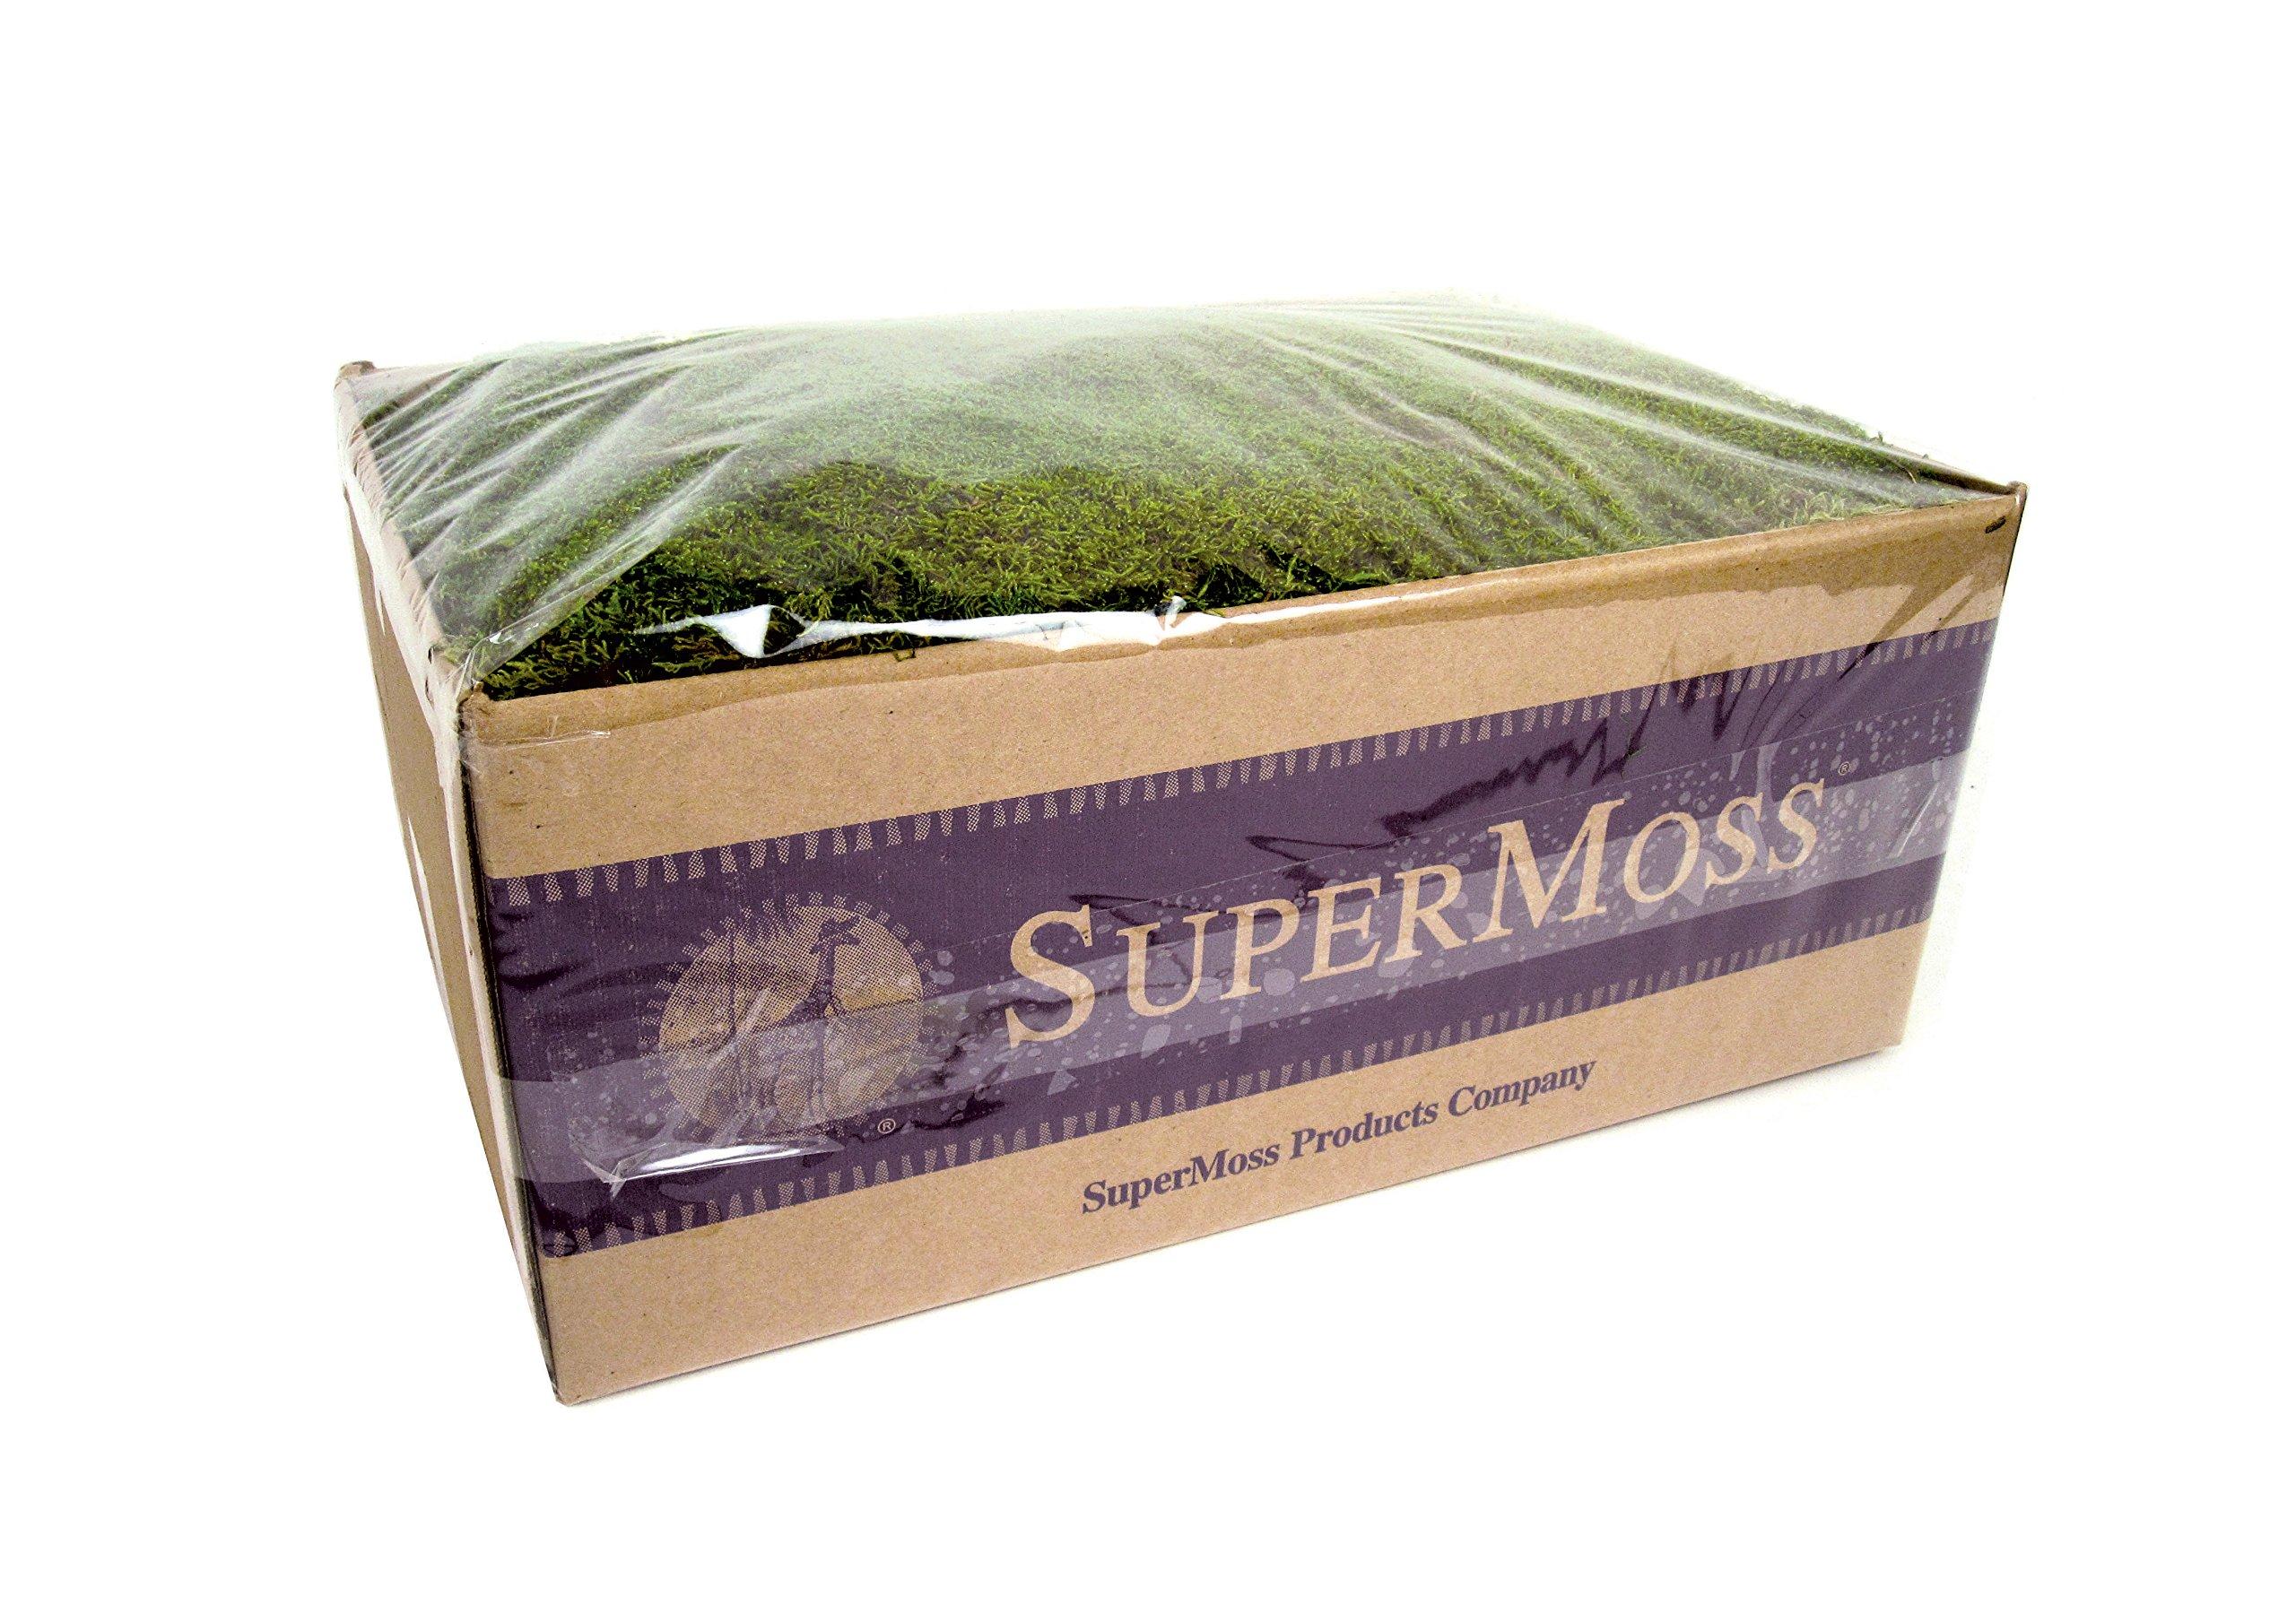 SuperMoss (21598) Sheet Moss Preserved, Fresh Green Wet Use (20-24 sq. ft. Approx 3.5lbs) by Super Moss